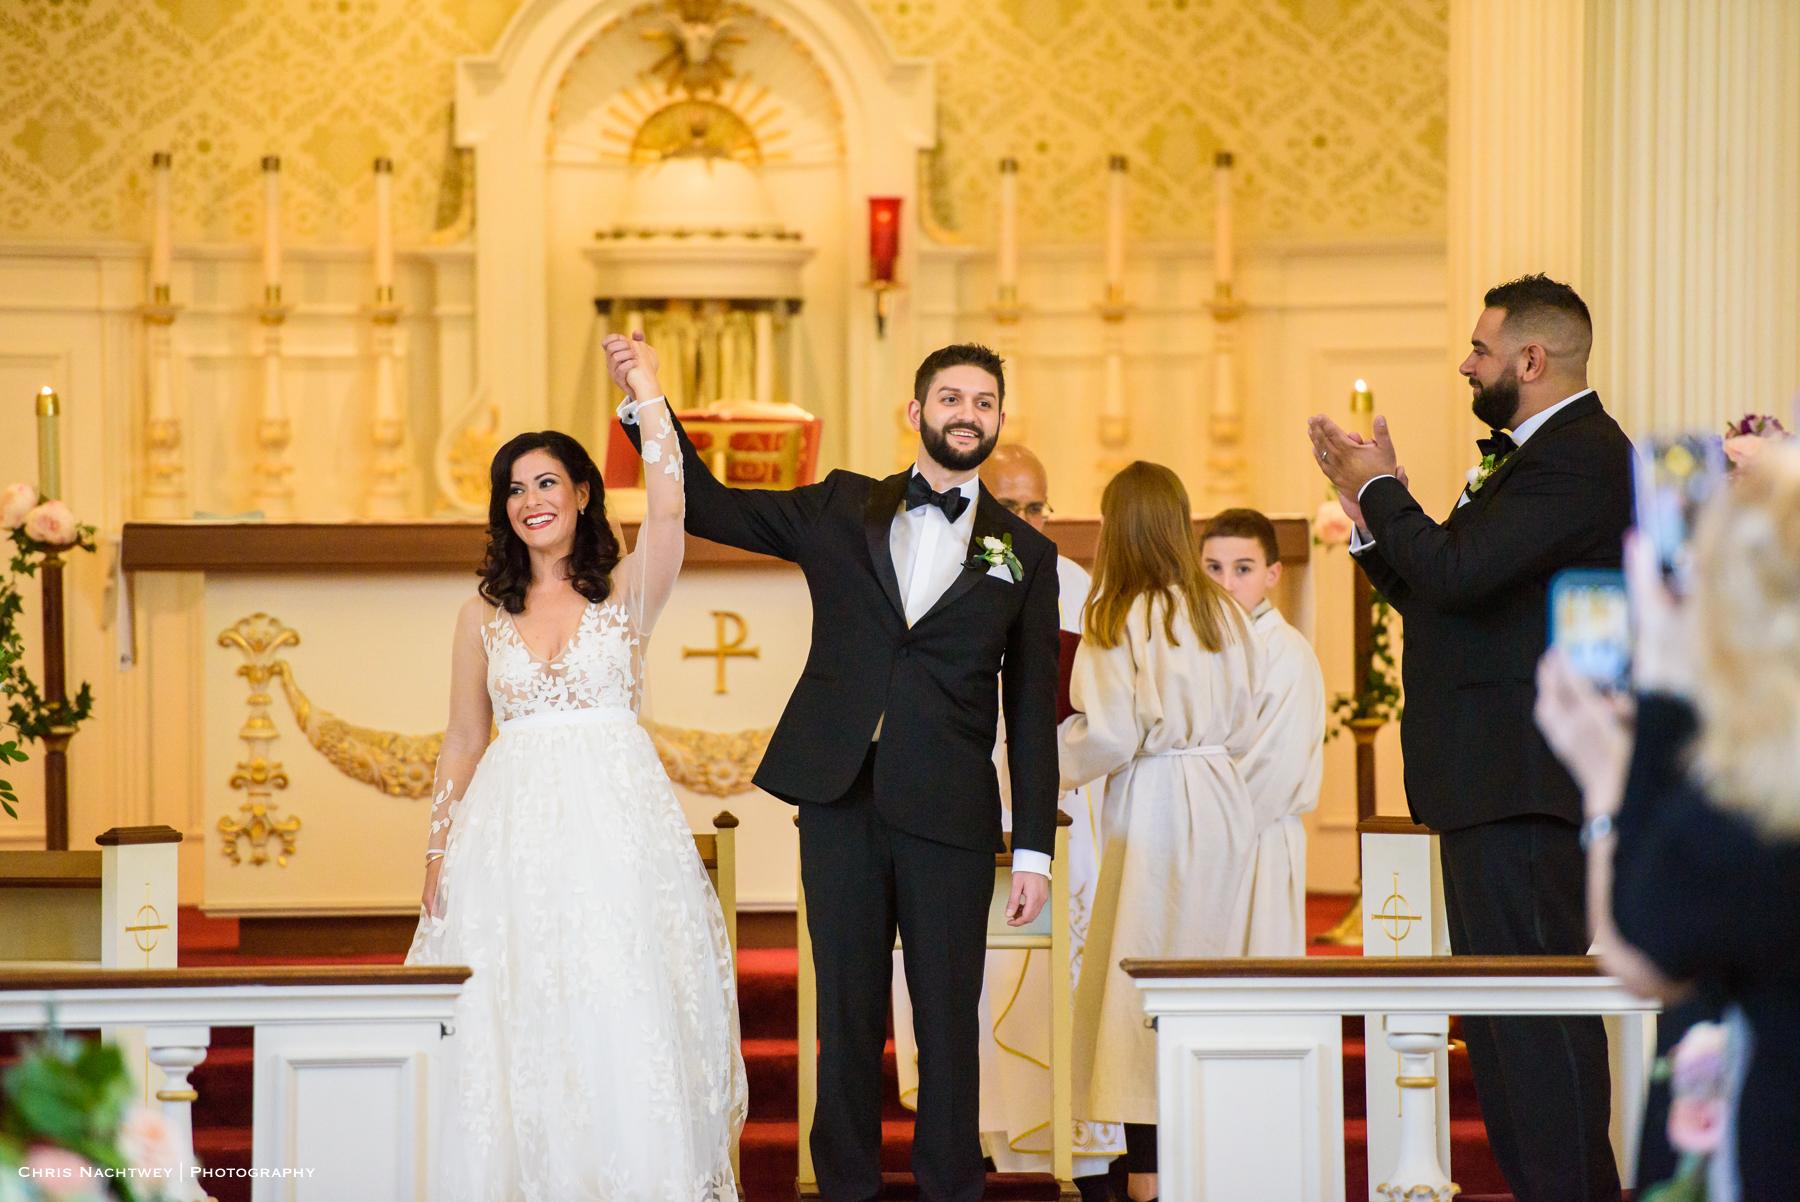 winter-branford-house-wedding-photos-groton-ct-chris-nachtwey-photography-2019-18.jpg